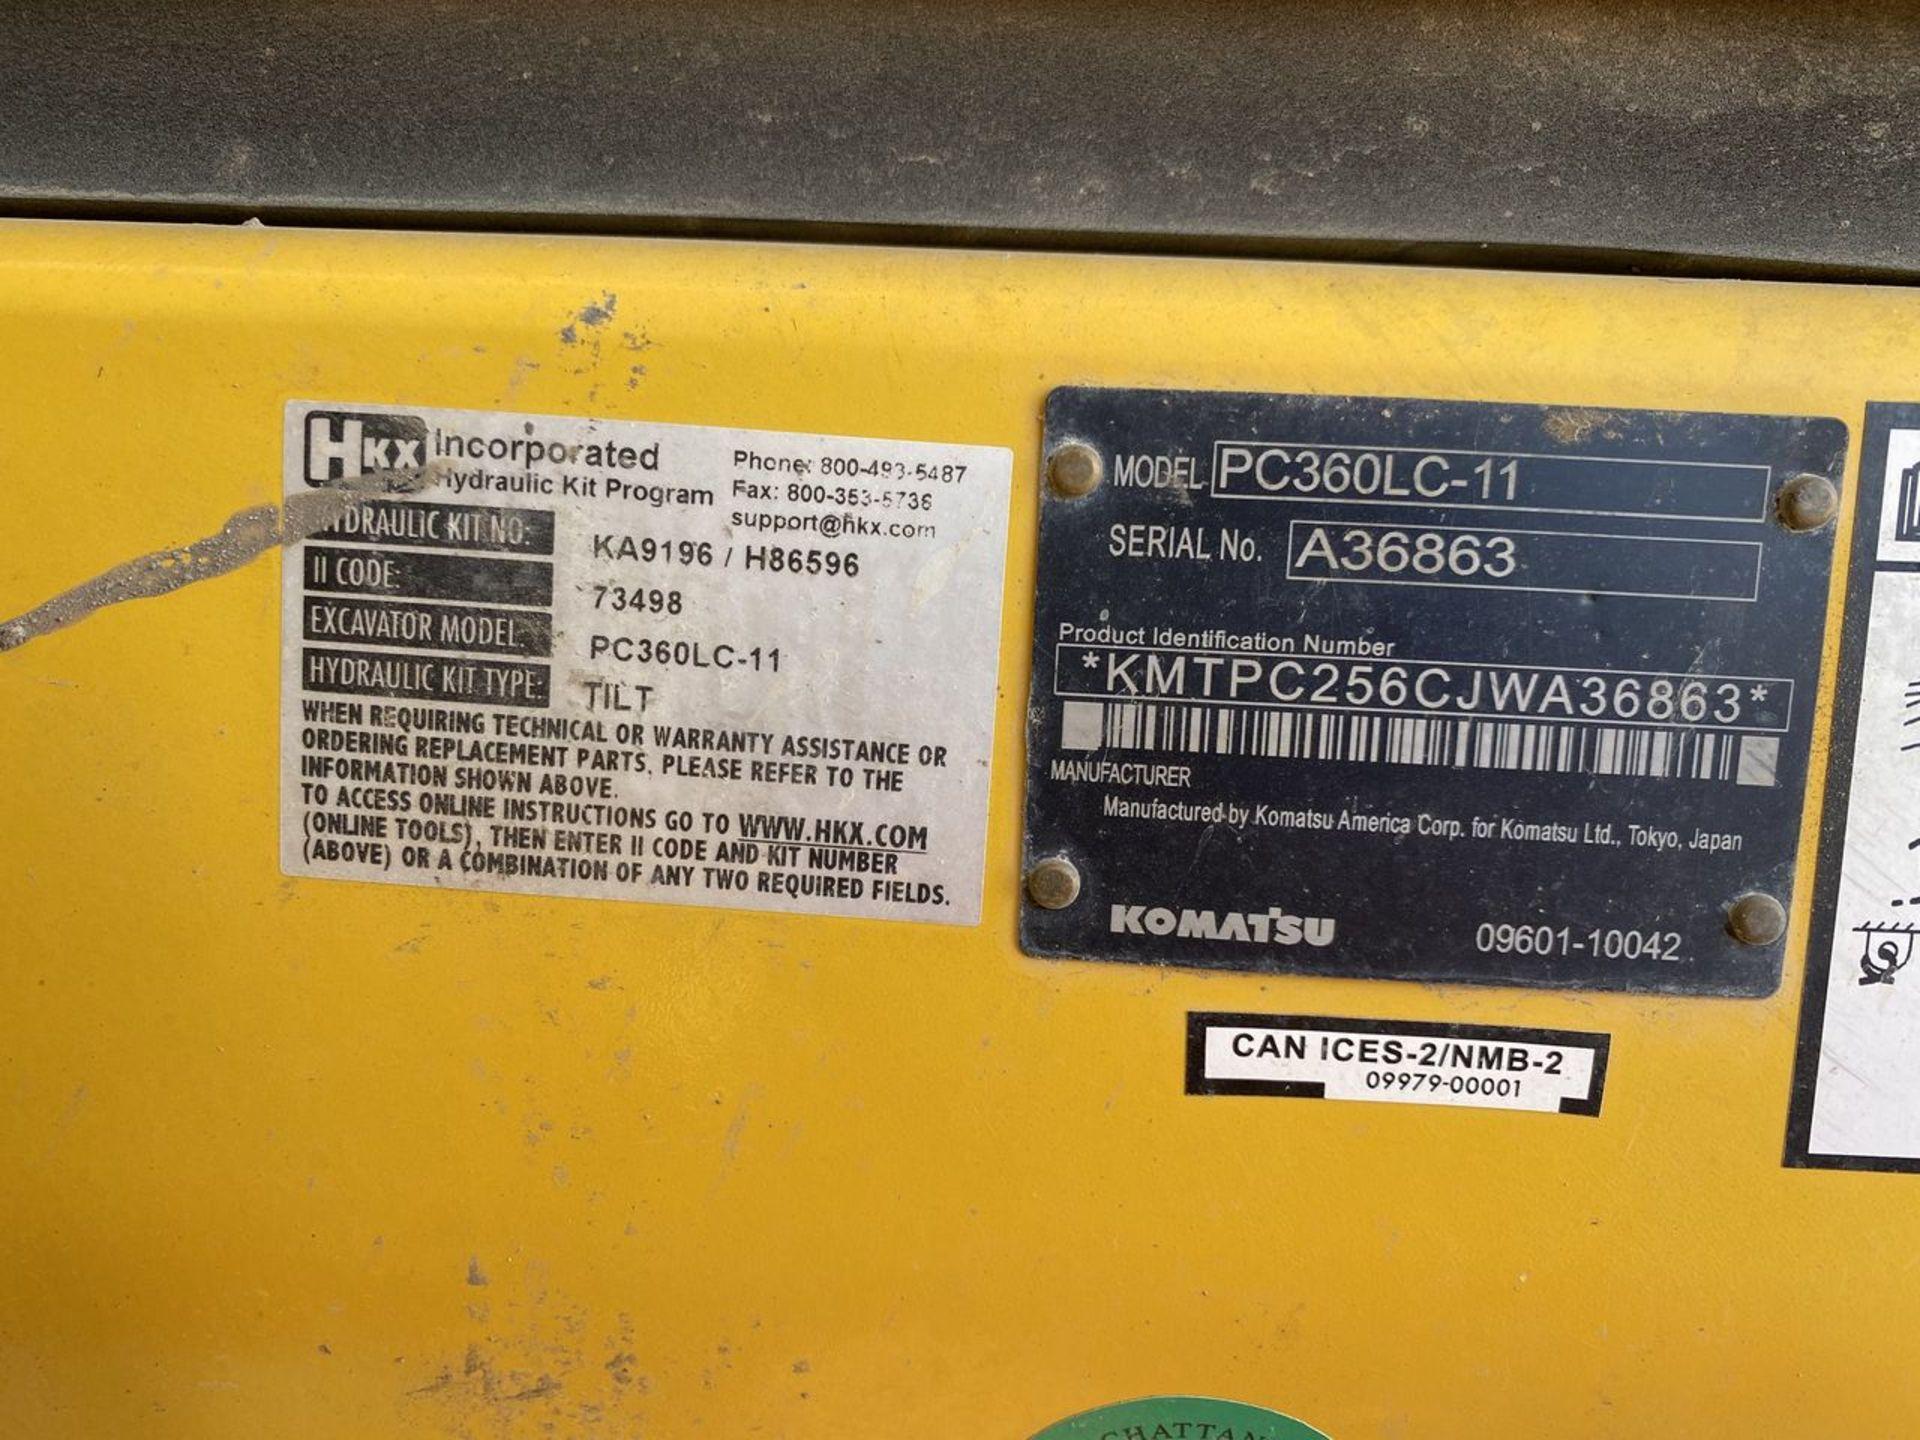 2018 Komatsu PC360LC-11 Hydraulic Crawler Excavator, S/N: A36863, PIN: KMTPC256CJWA36863; with 2,883 - Image 19 of 19